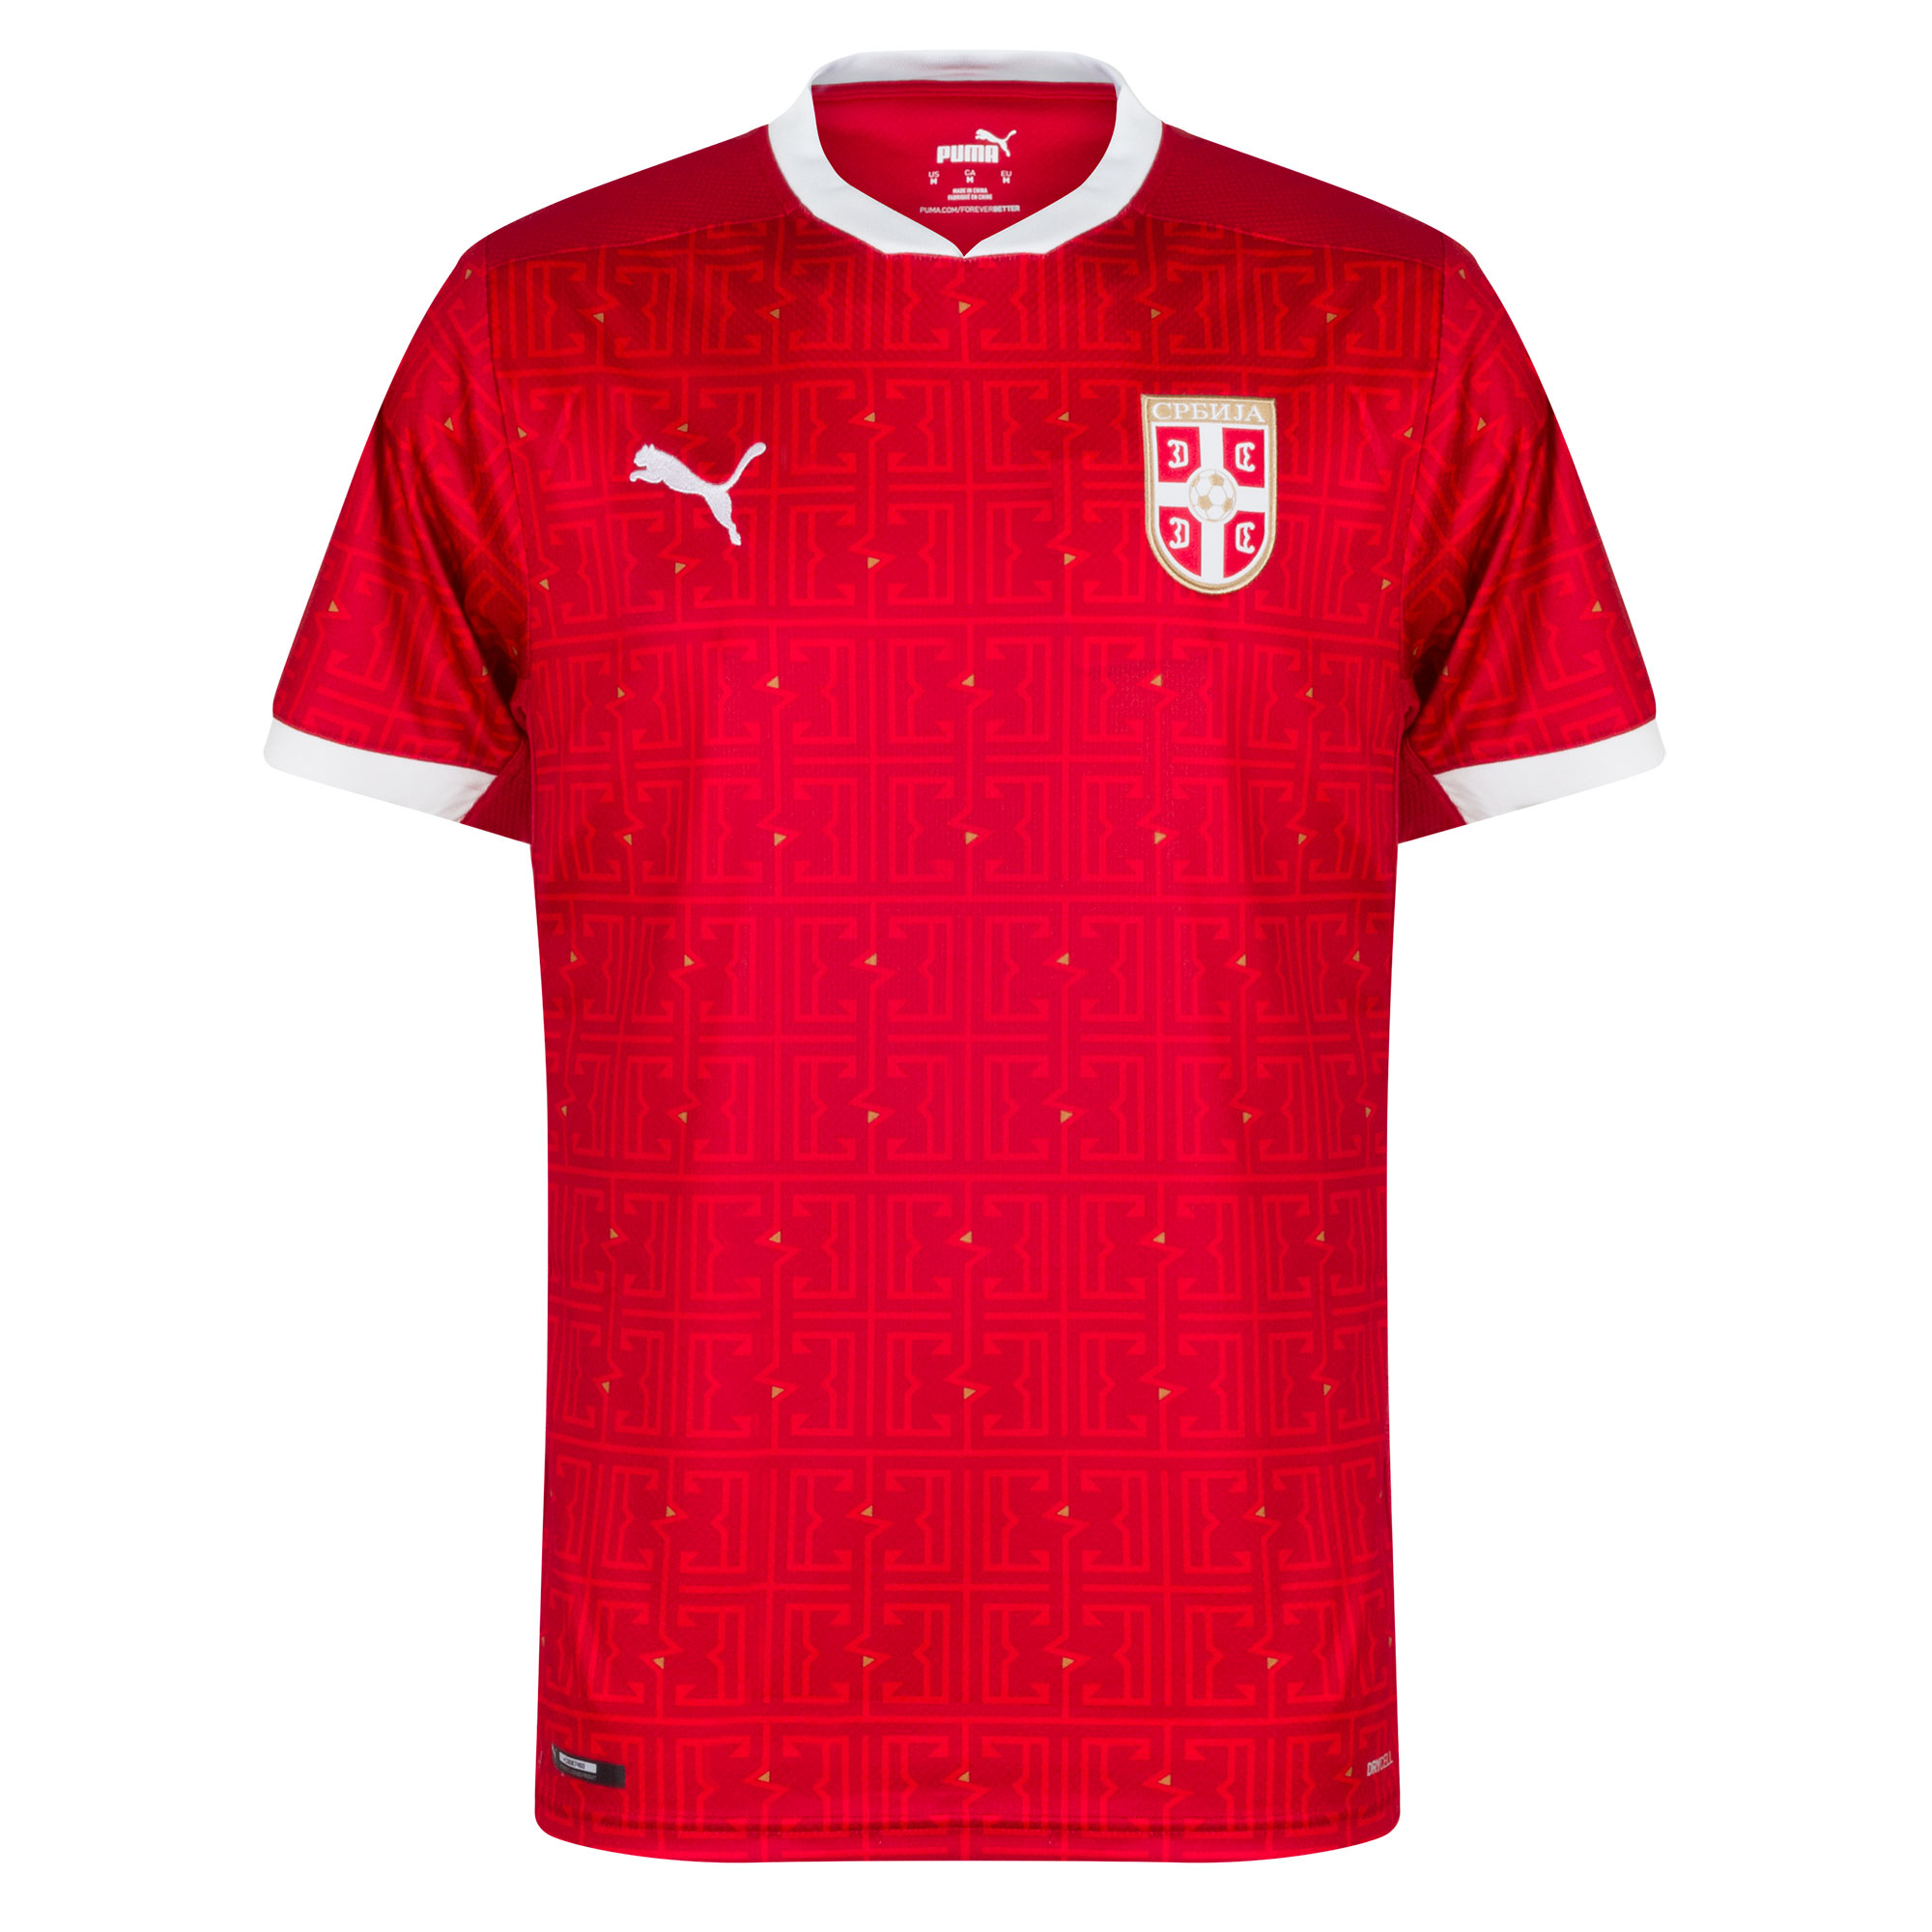 Puma Serbia Home Shirt 2020-2021